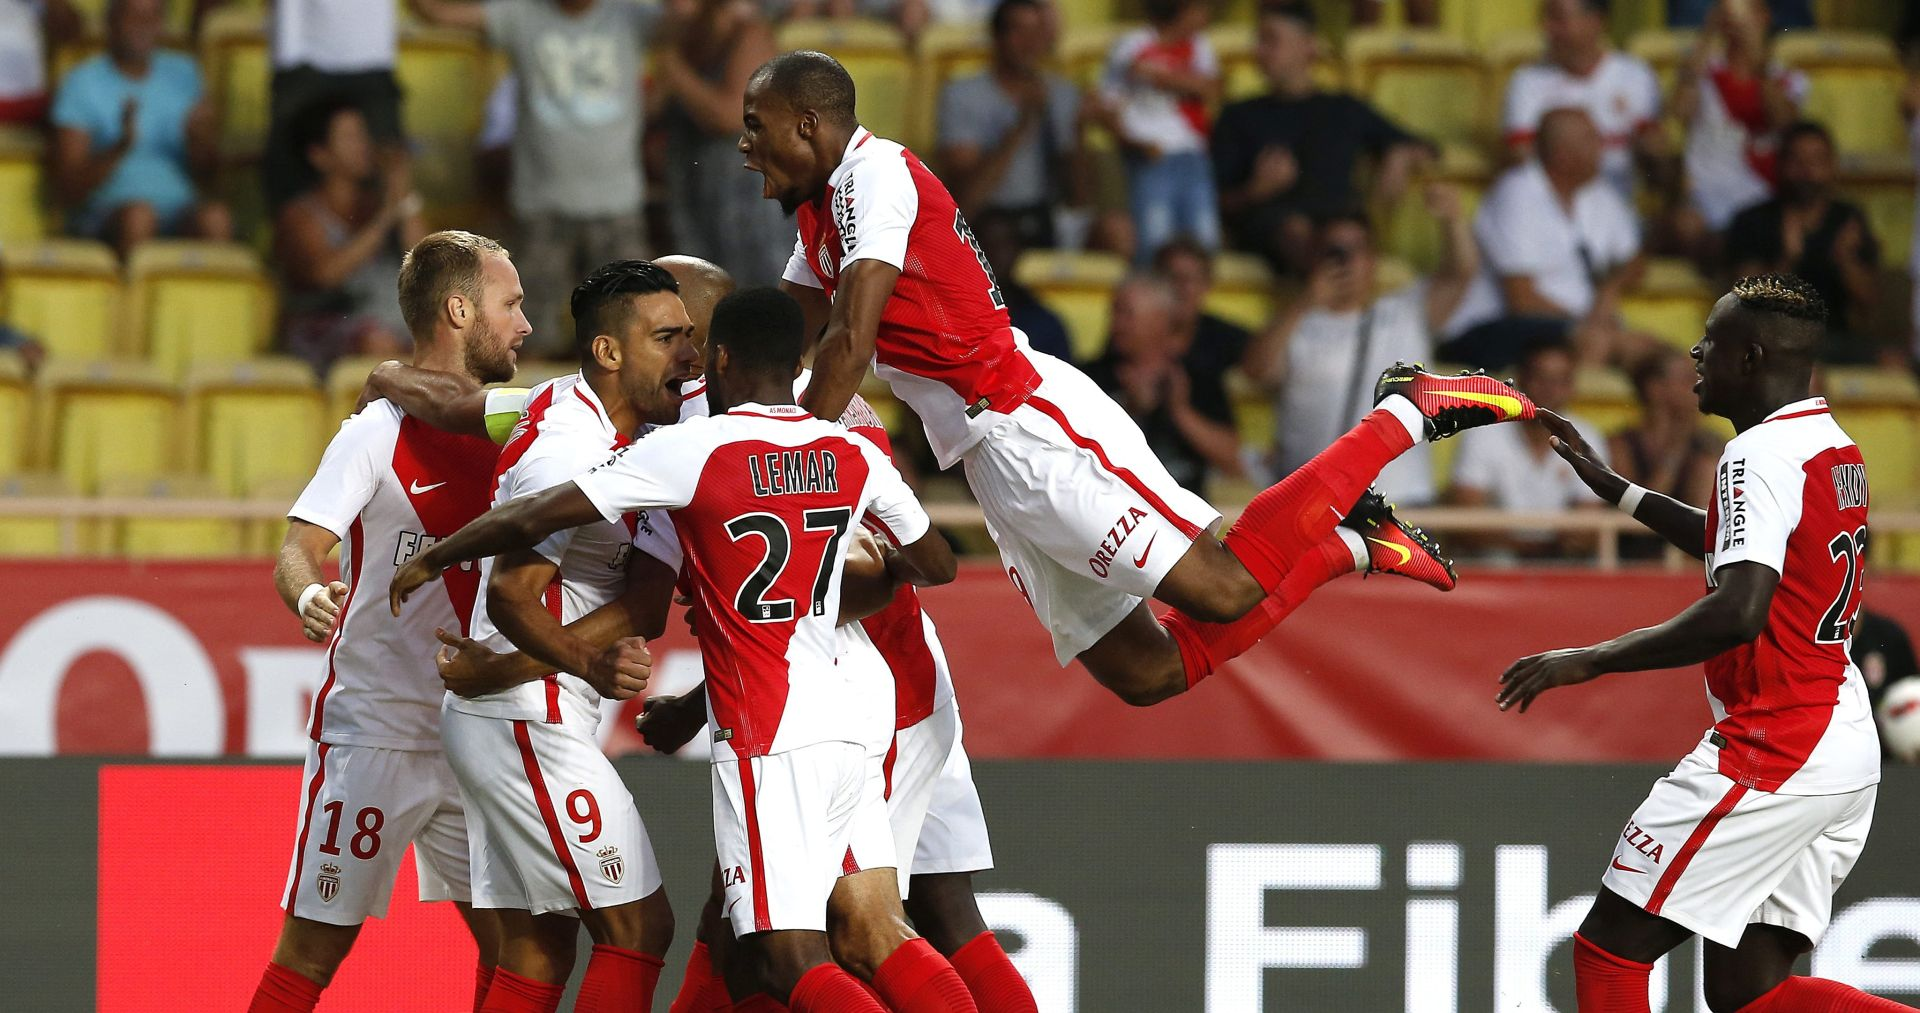 LOŠE PONAŠANJE: Braniču Monaca Mendyju pet utakmica kazne